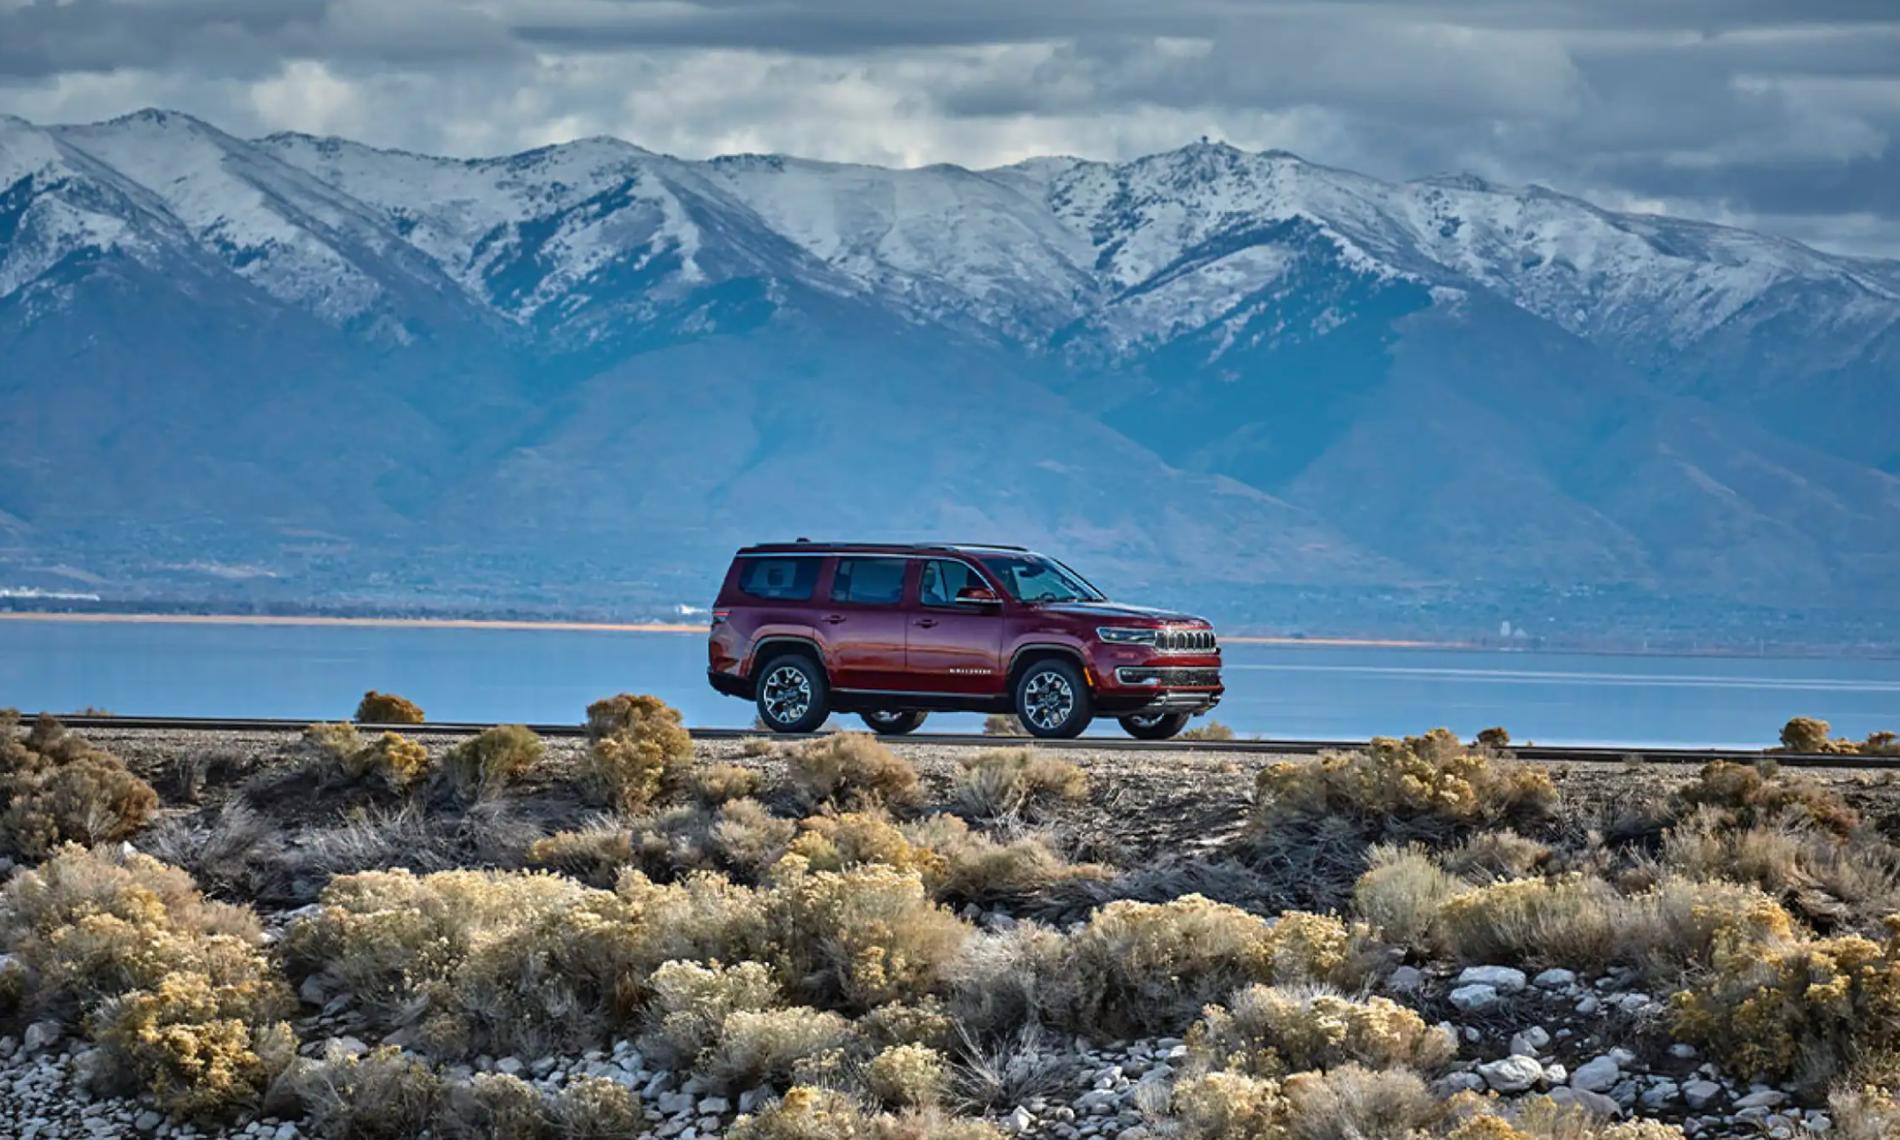 2021 Jeep Wagoneer Dealer